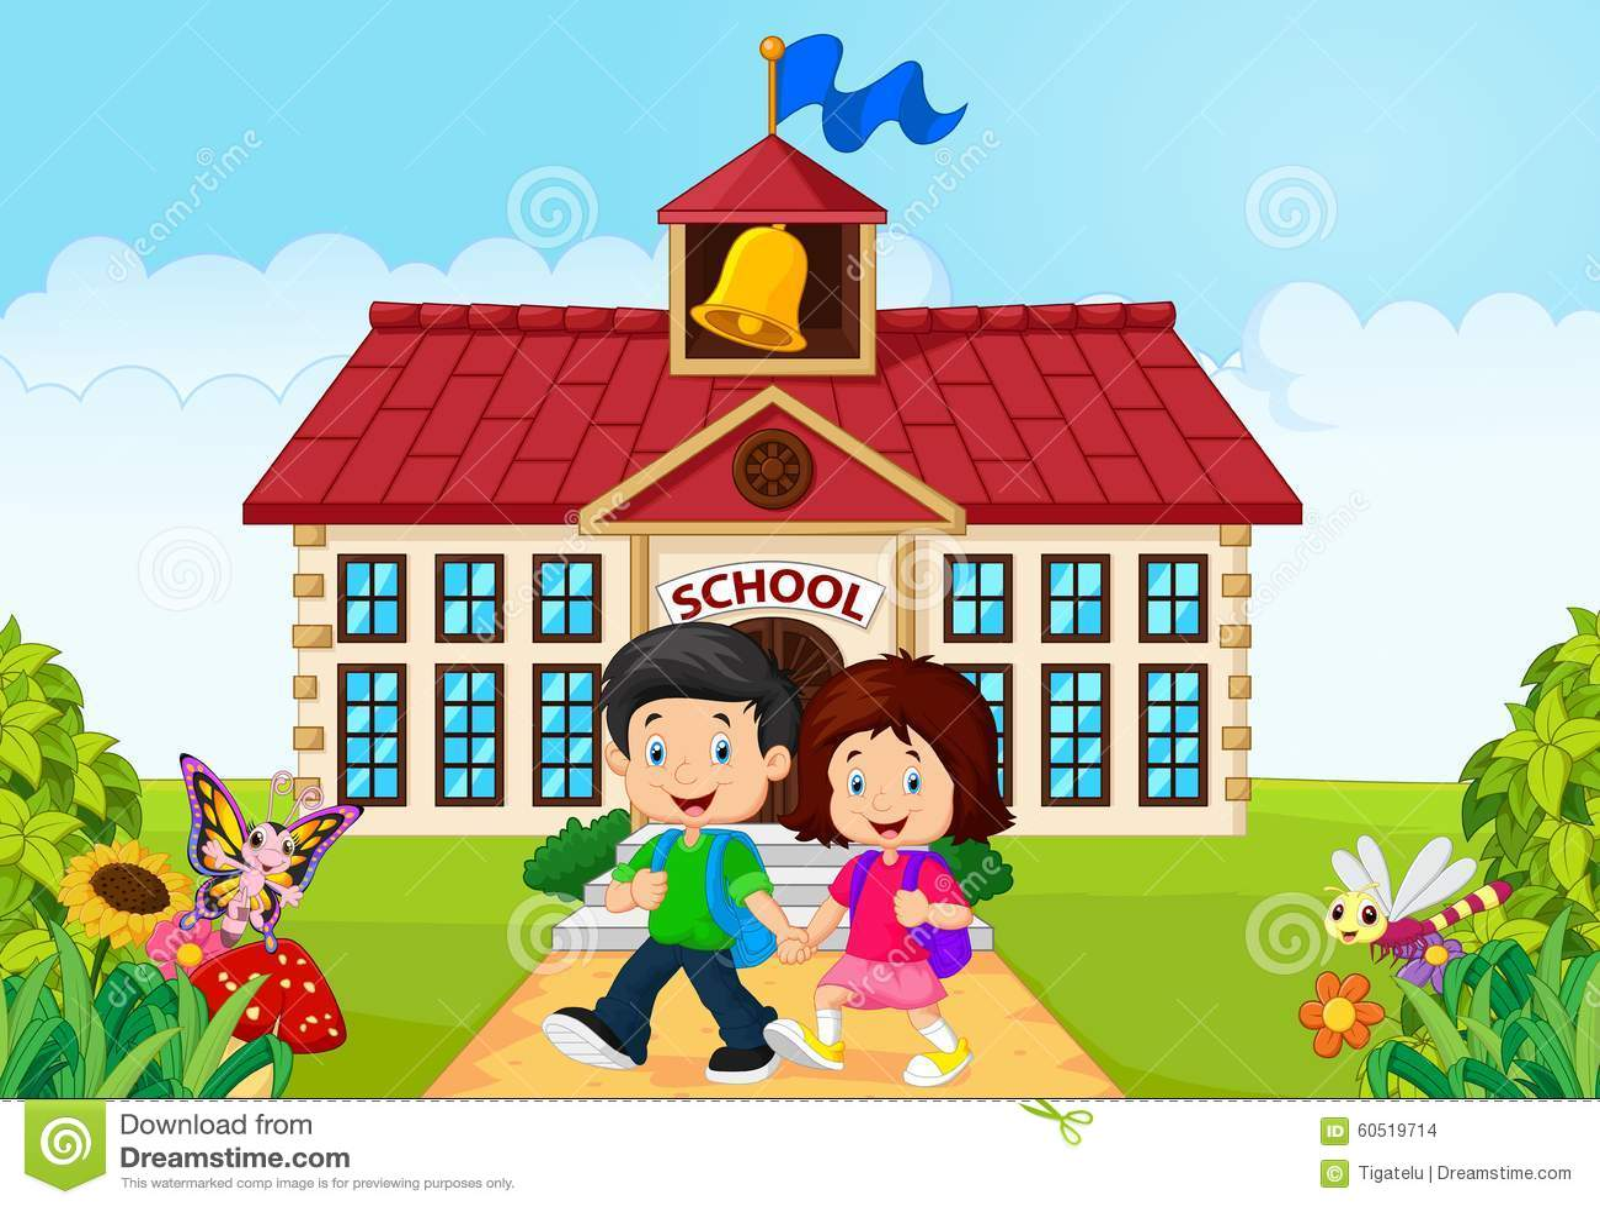 girl child education india essay